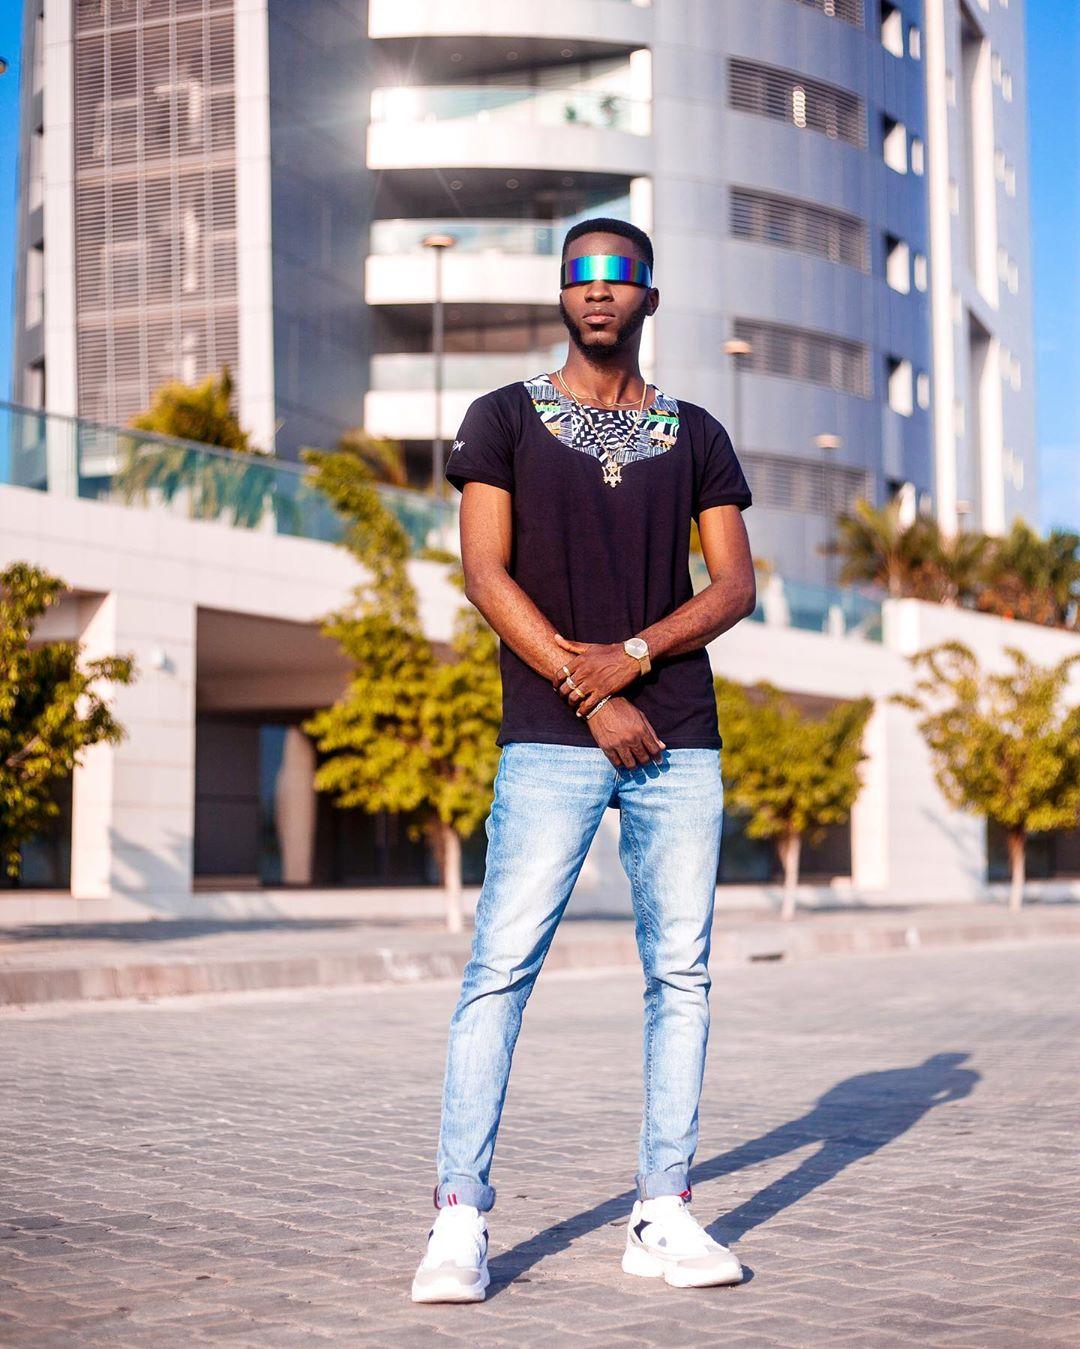 akin-faminu-Nigerian-male-celebrities-style